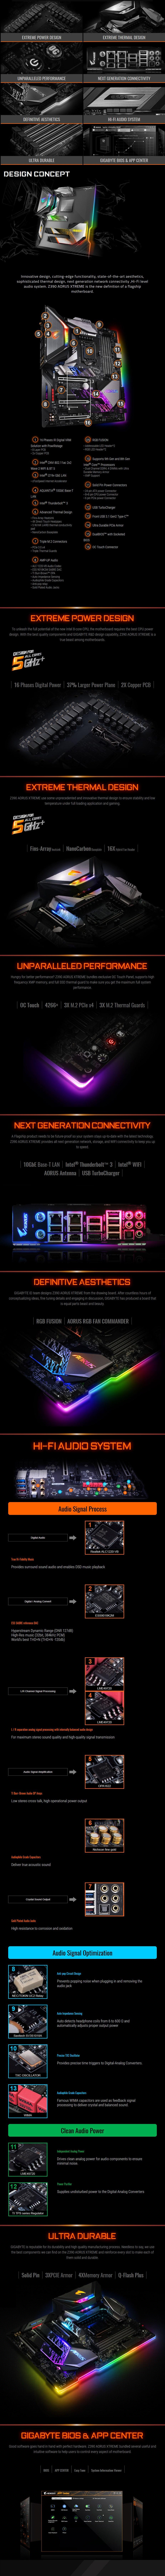 Gigabyte Z390 AORUS XTREME LGA 1151 E-ATX Motherboard - Desktop Overview 1